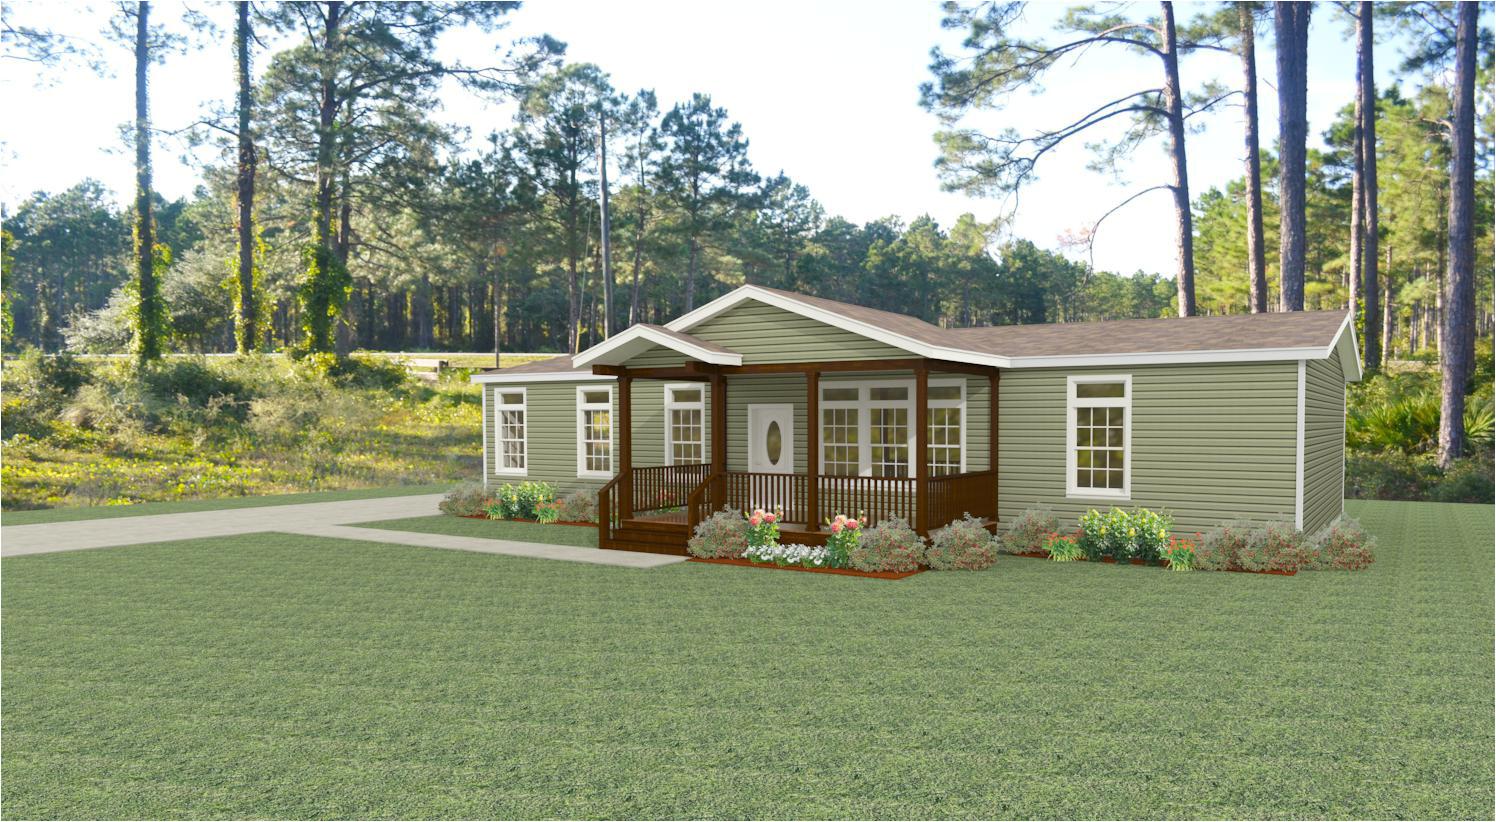 exterior rendering jacobsen homes floor plan imlt 46412b with porch